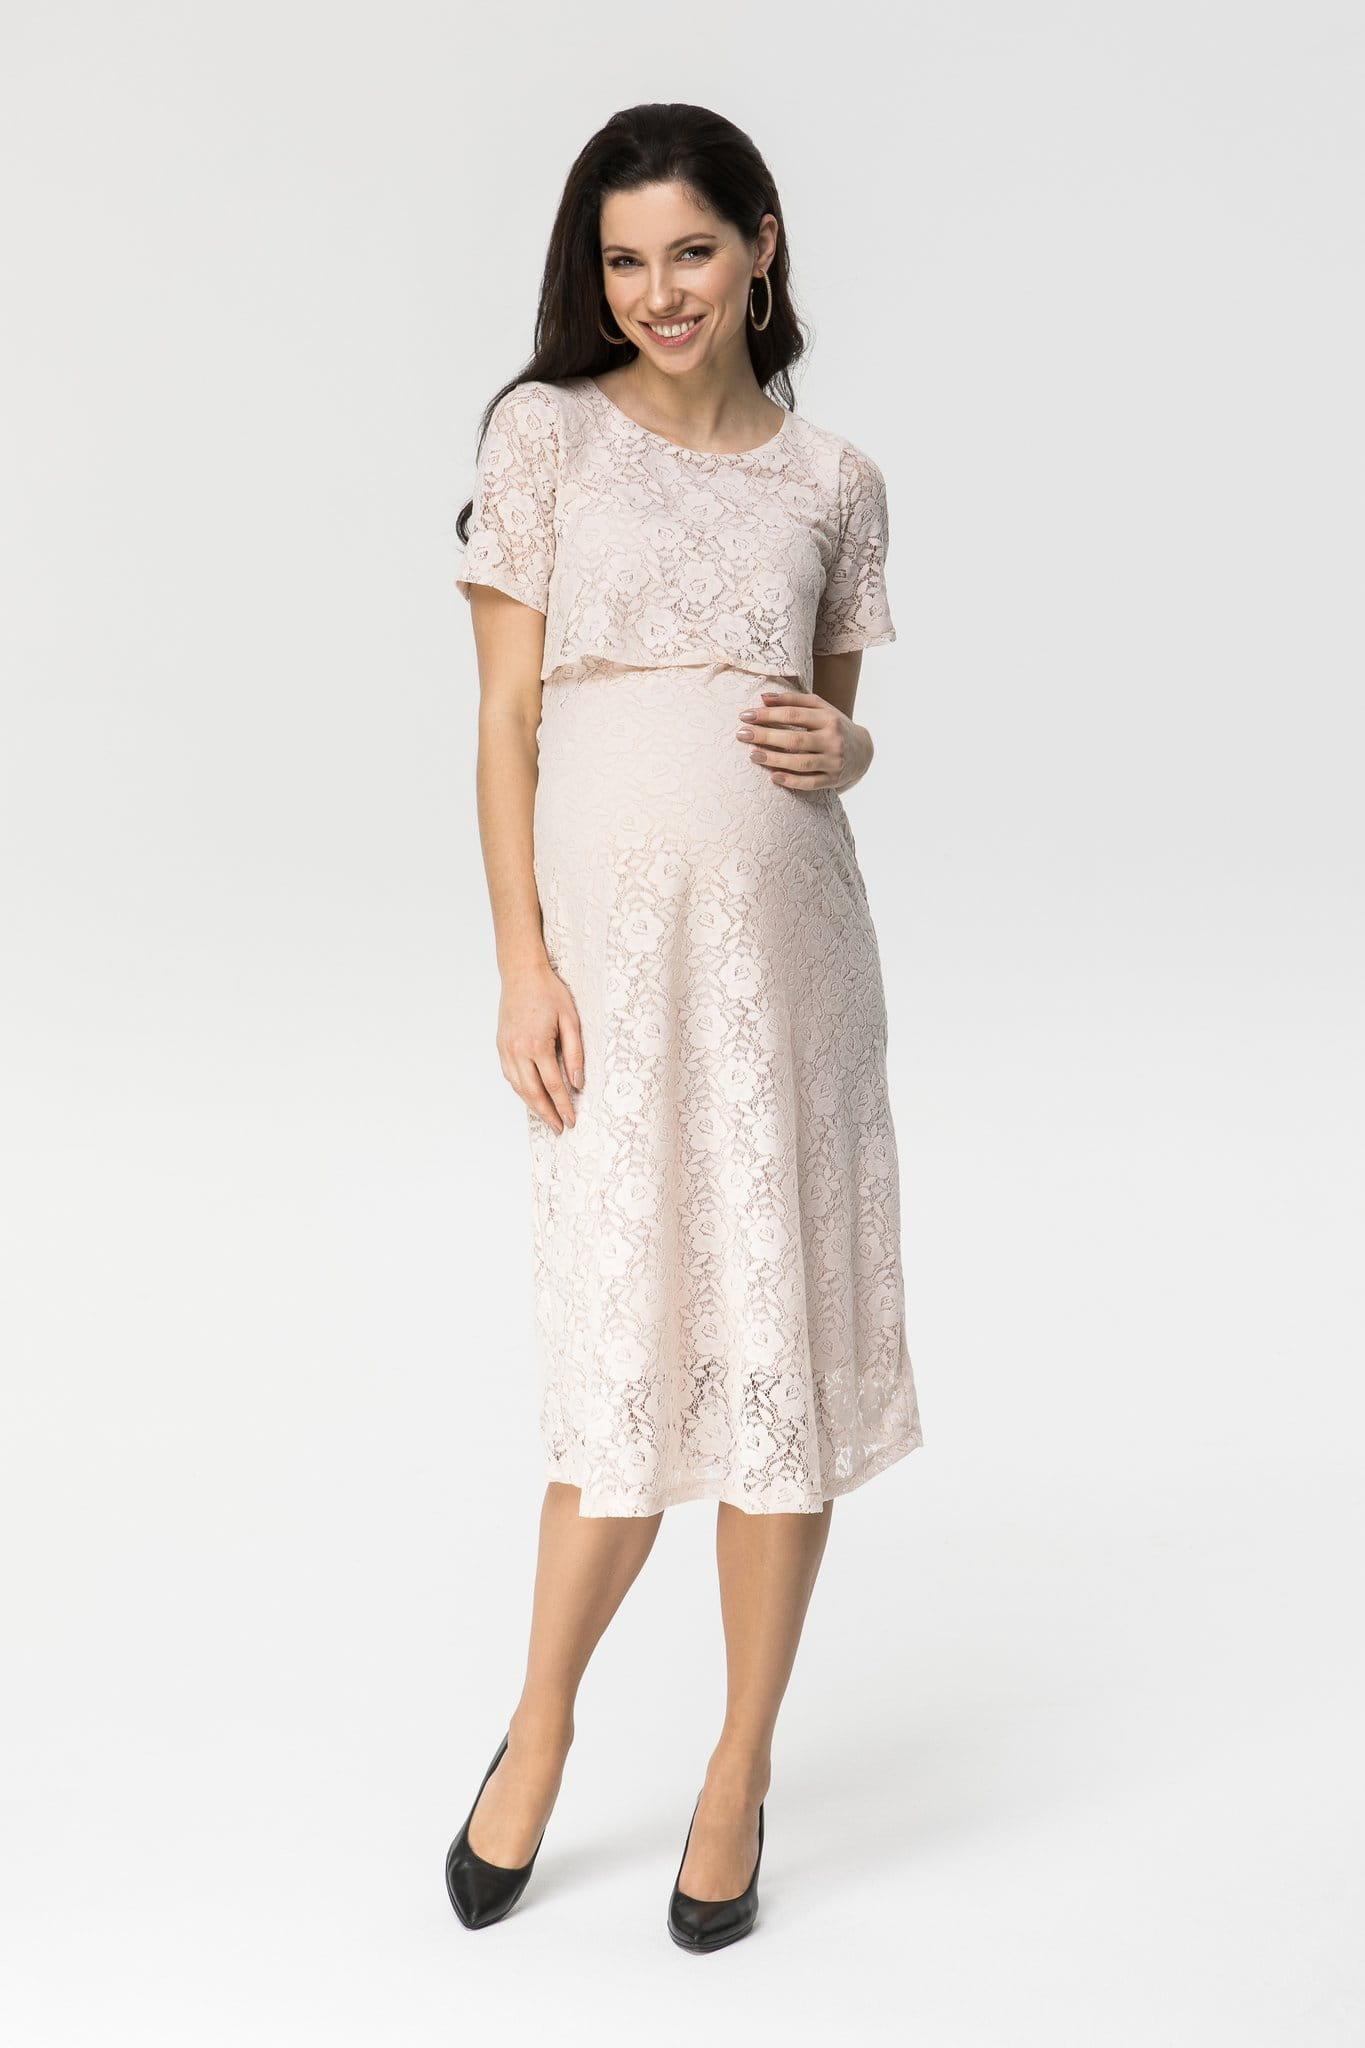 120c18fb4 Romantic róż koronkowa sukienka do karmienia i ciążowa COOL Mamabaja